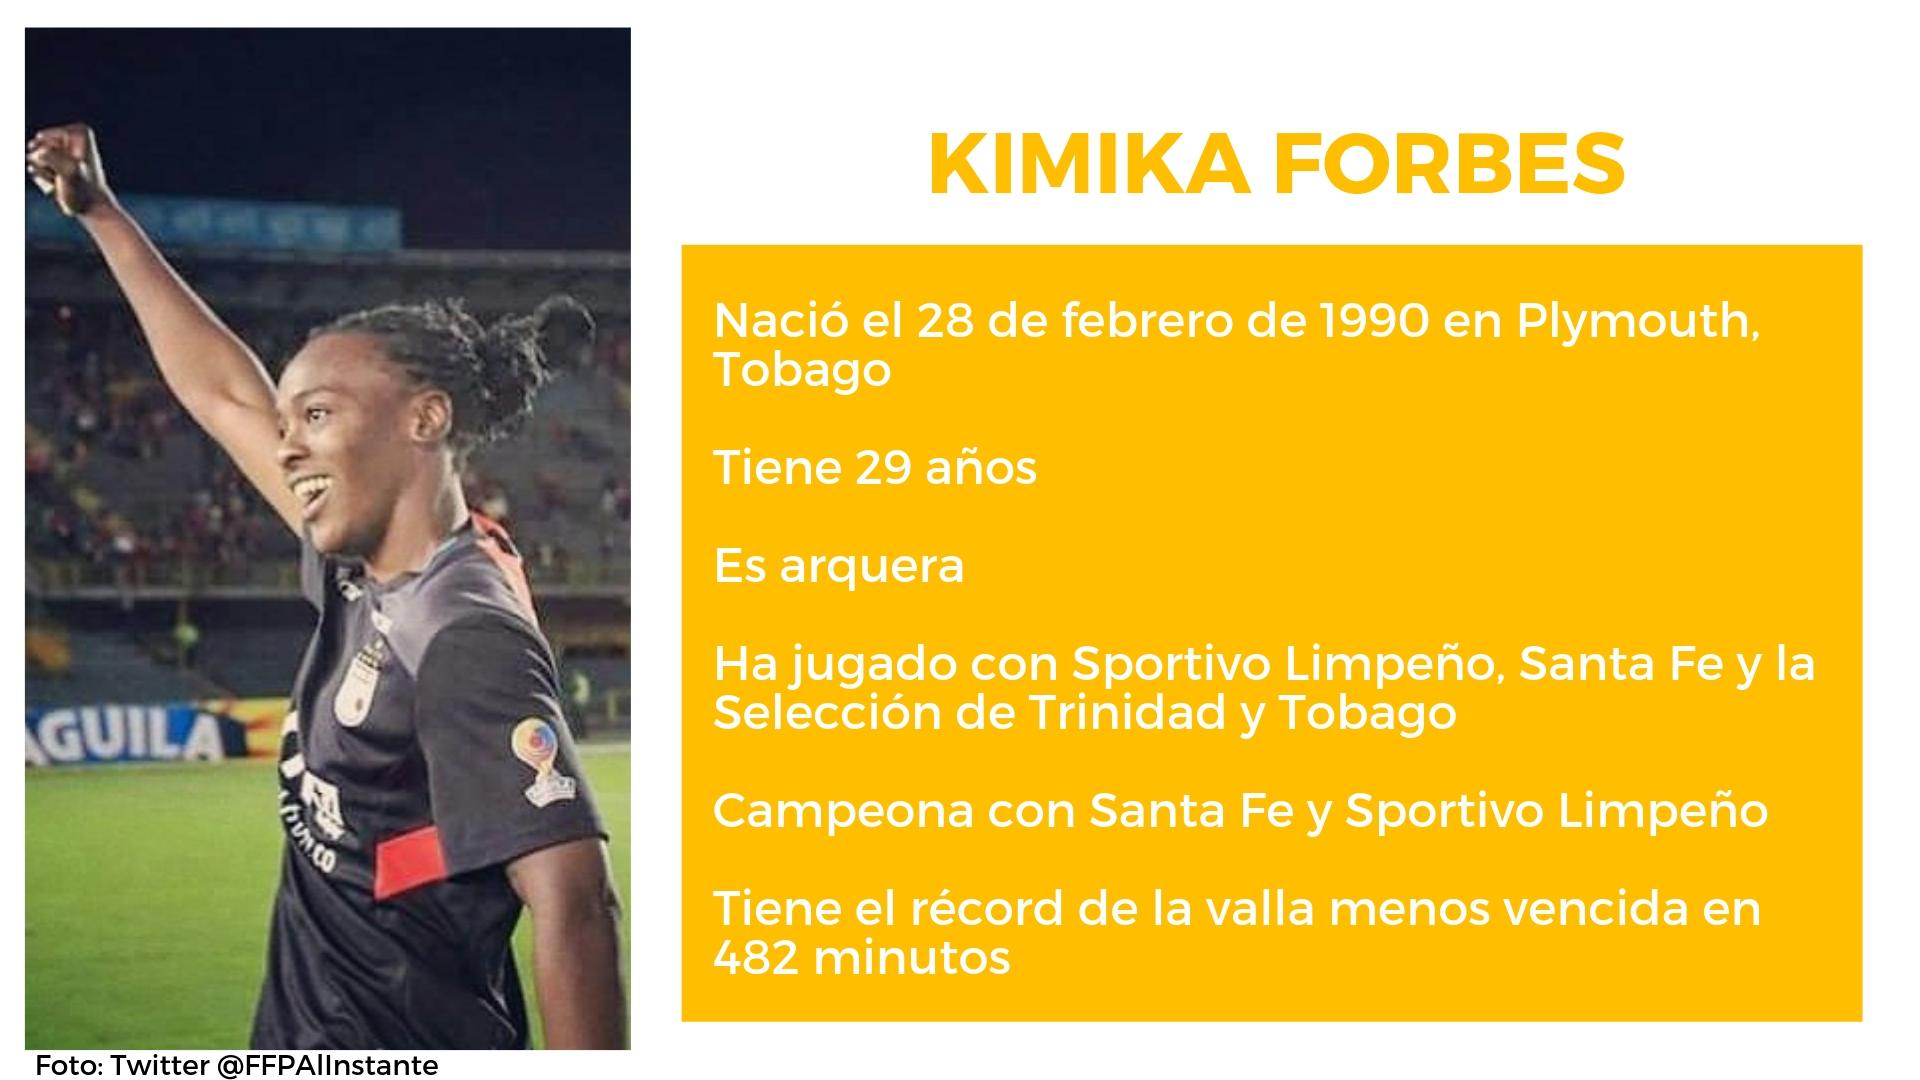 Kimika Forbes